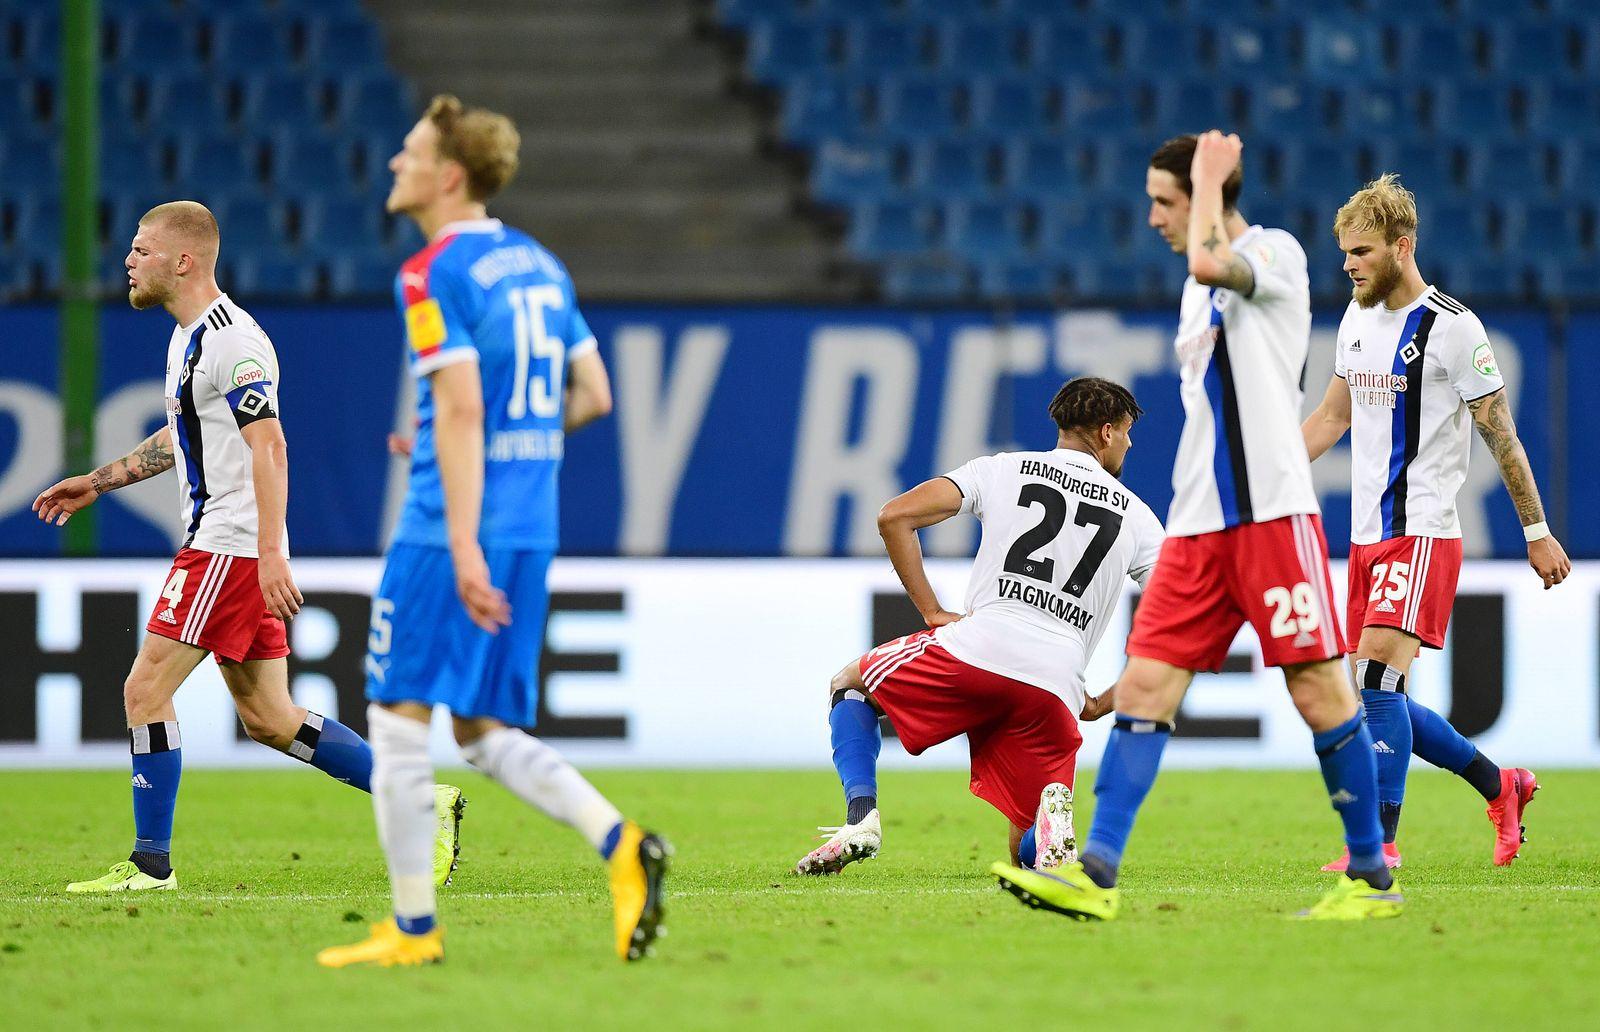 Hamburger SV - Holstein Kiel Fußball, 2. Bundesliga 2019/20, Hamburger SV - Holstein Kiel: v.l. Rick van Drongelen, Jos